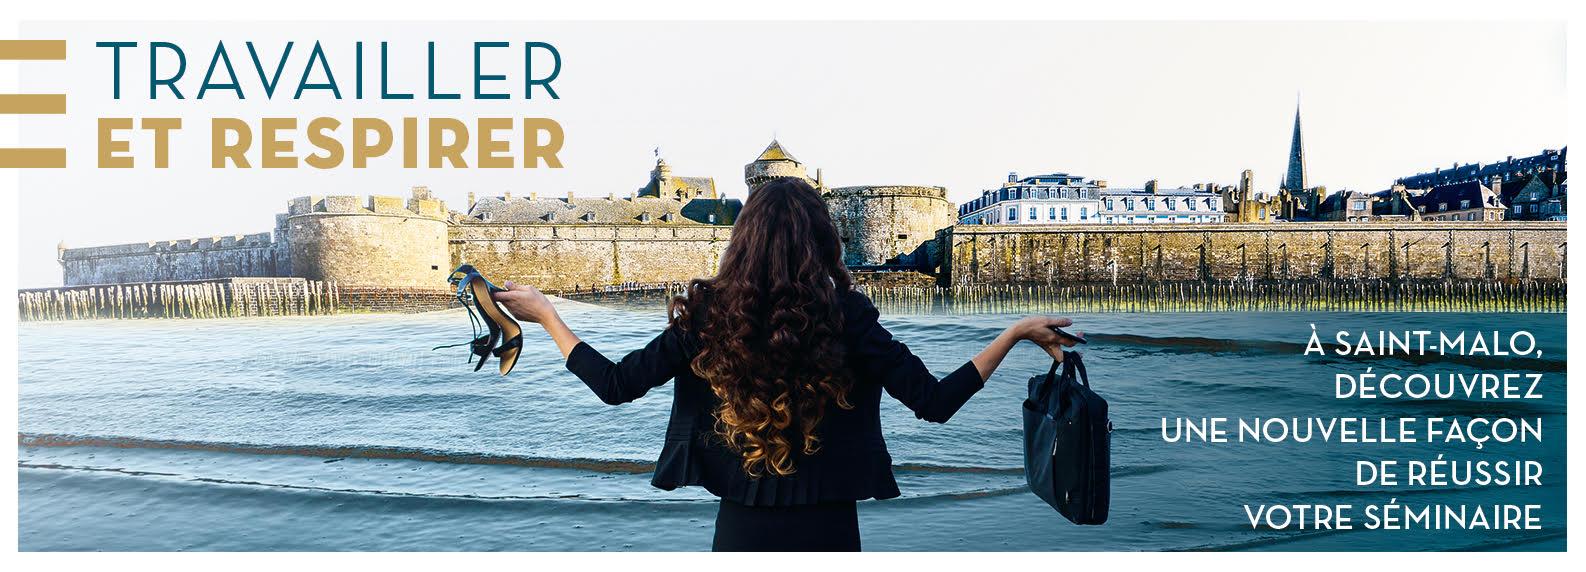 Travailler et respirer : seminaire à Saint-Malo